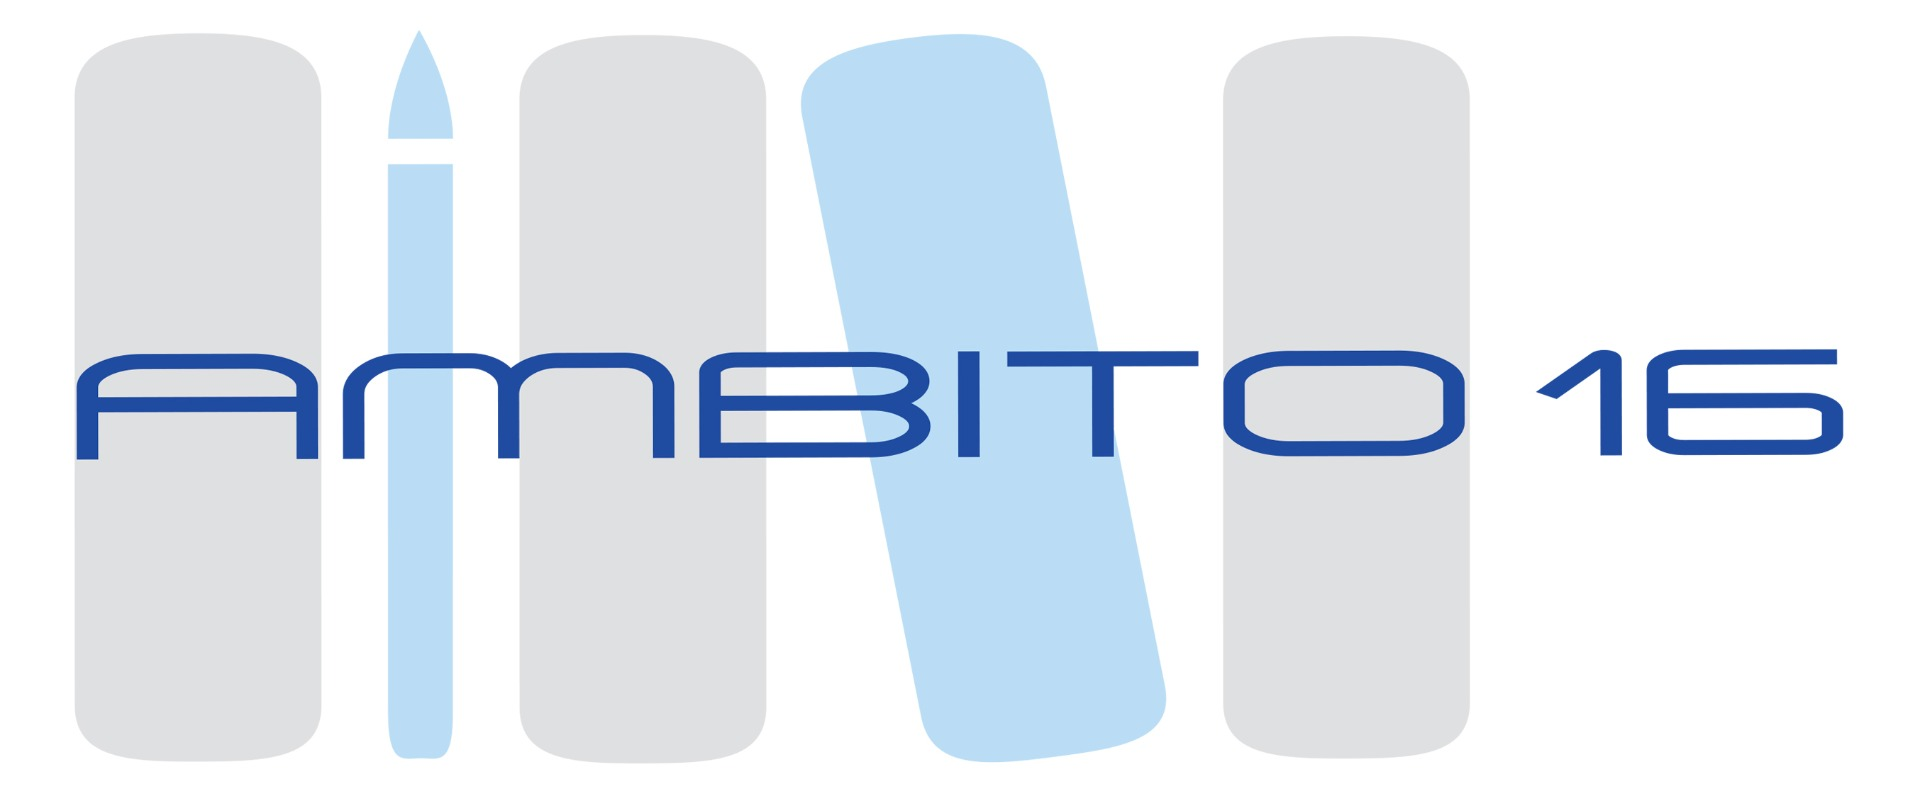 Ambito 16